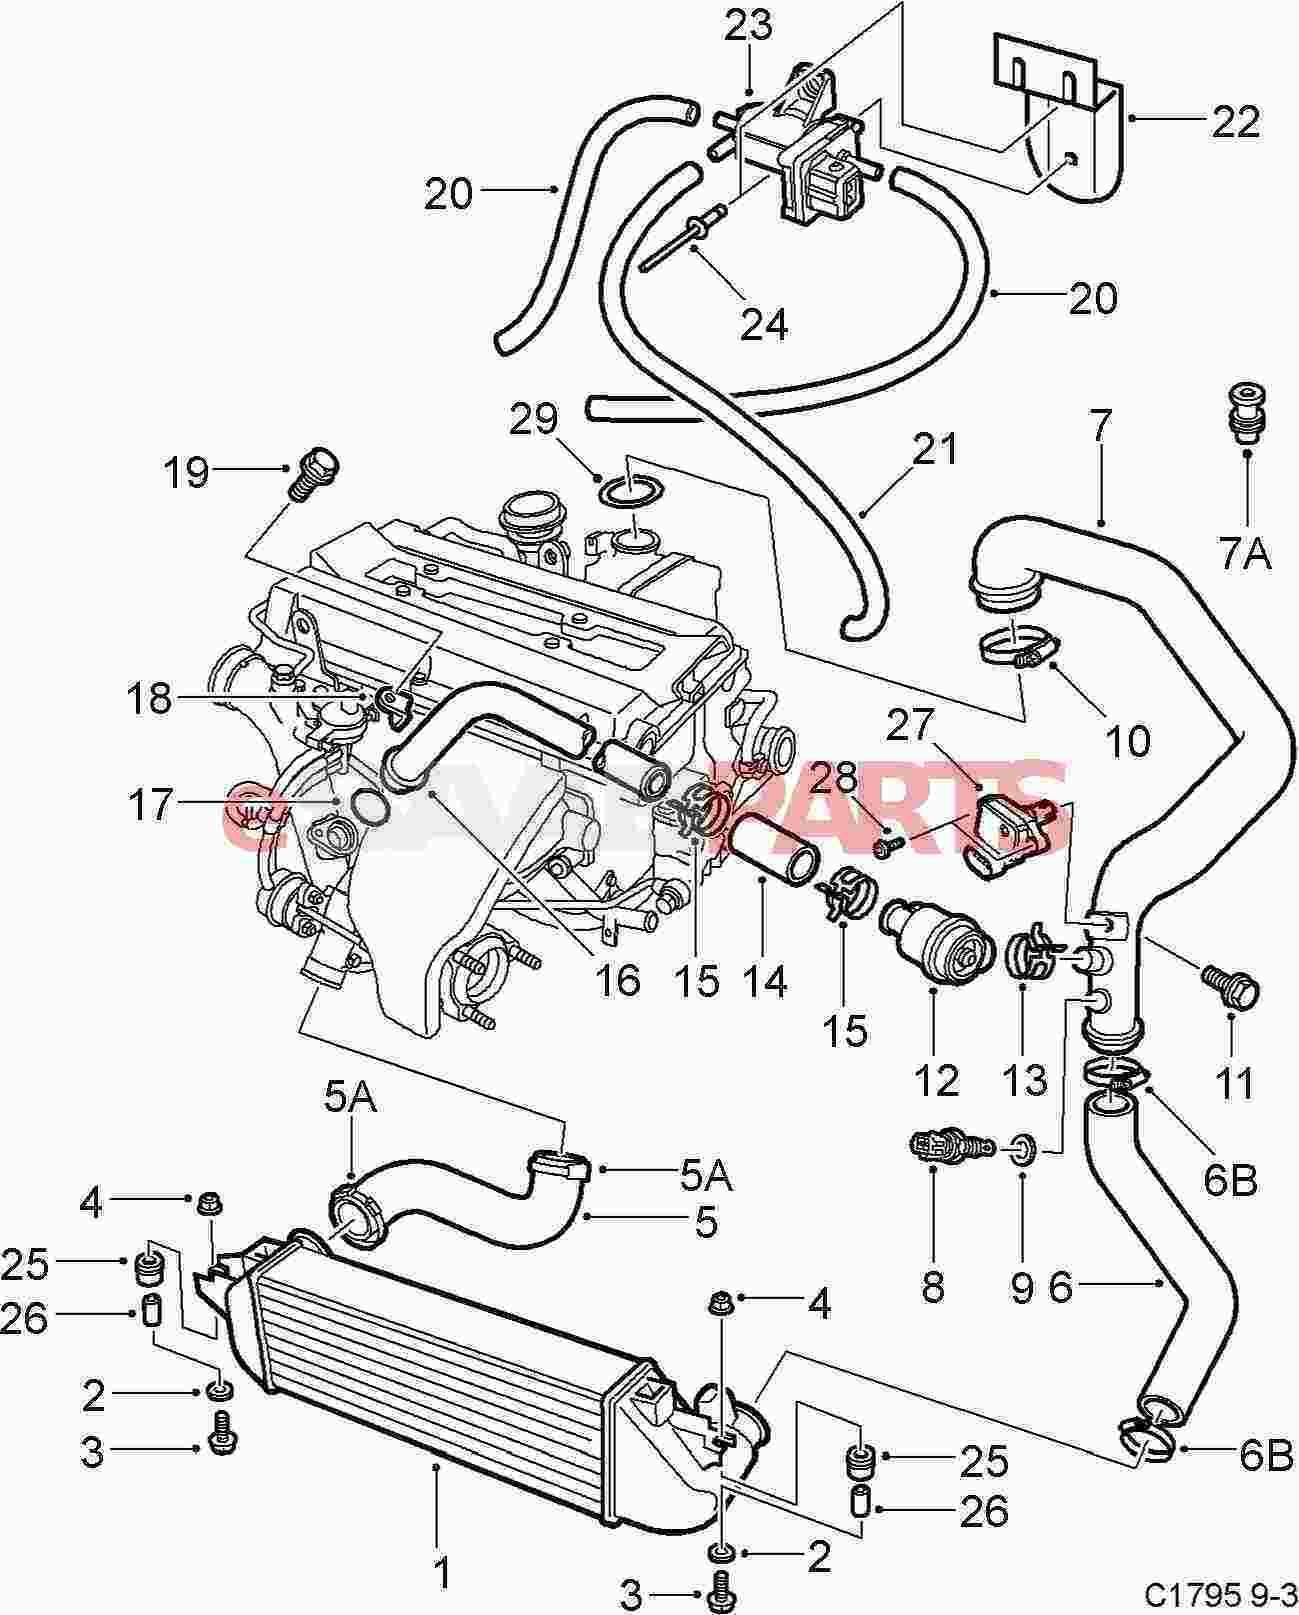 Saab 900 Turbo Wiring Diagram